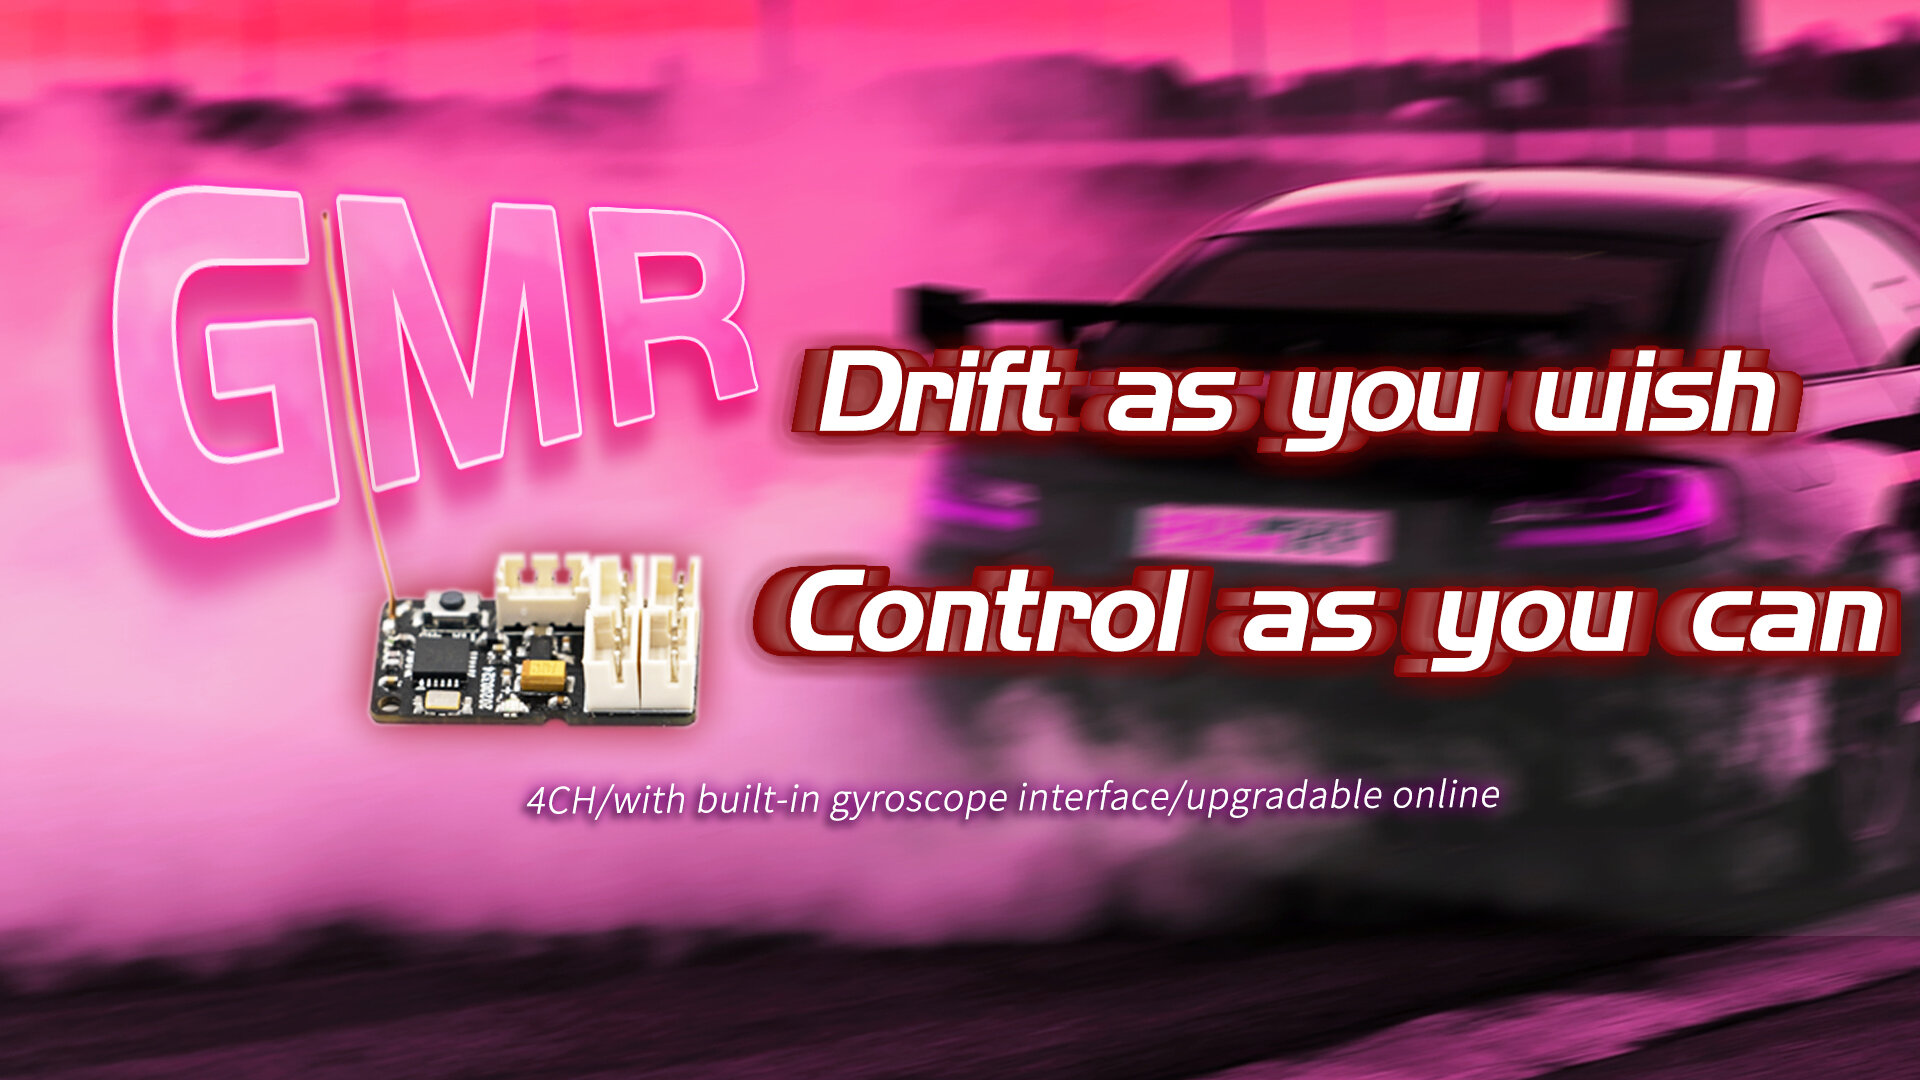 +GMRdrift as you can.jpg